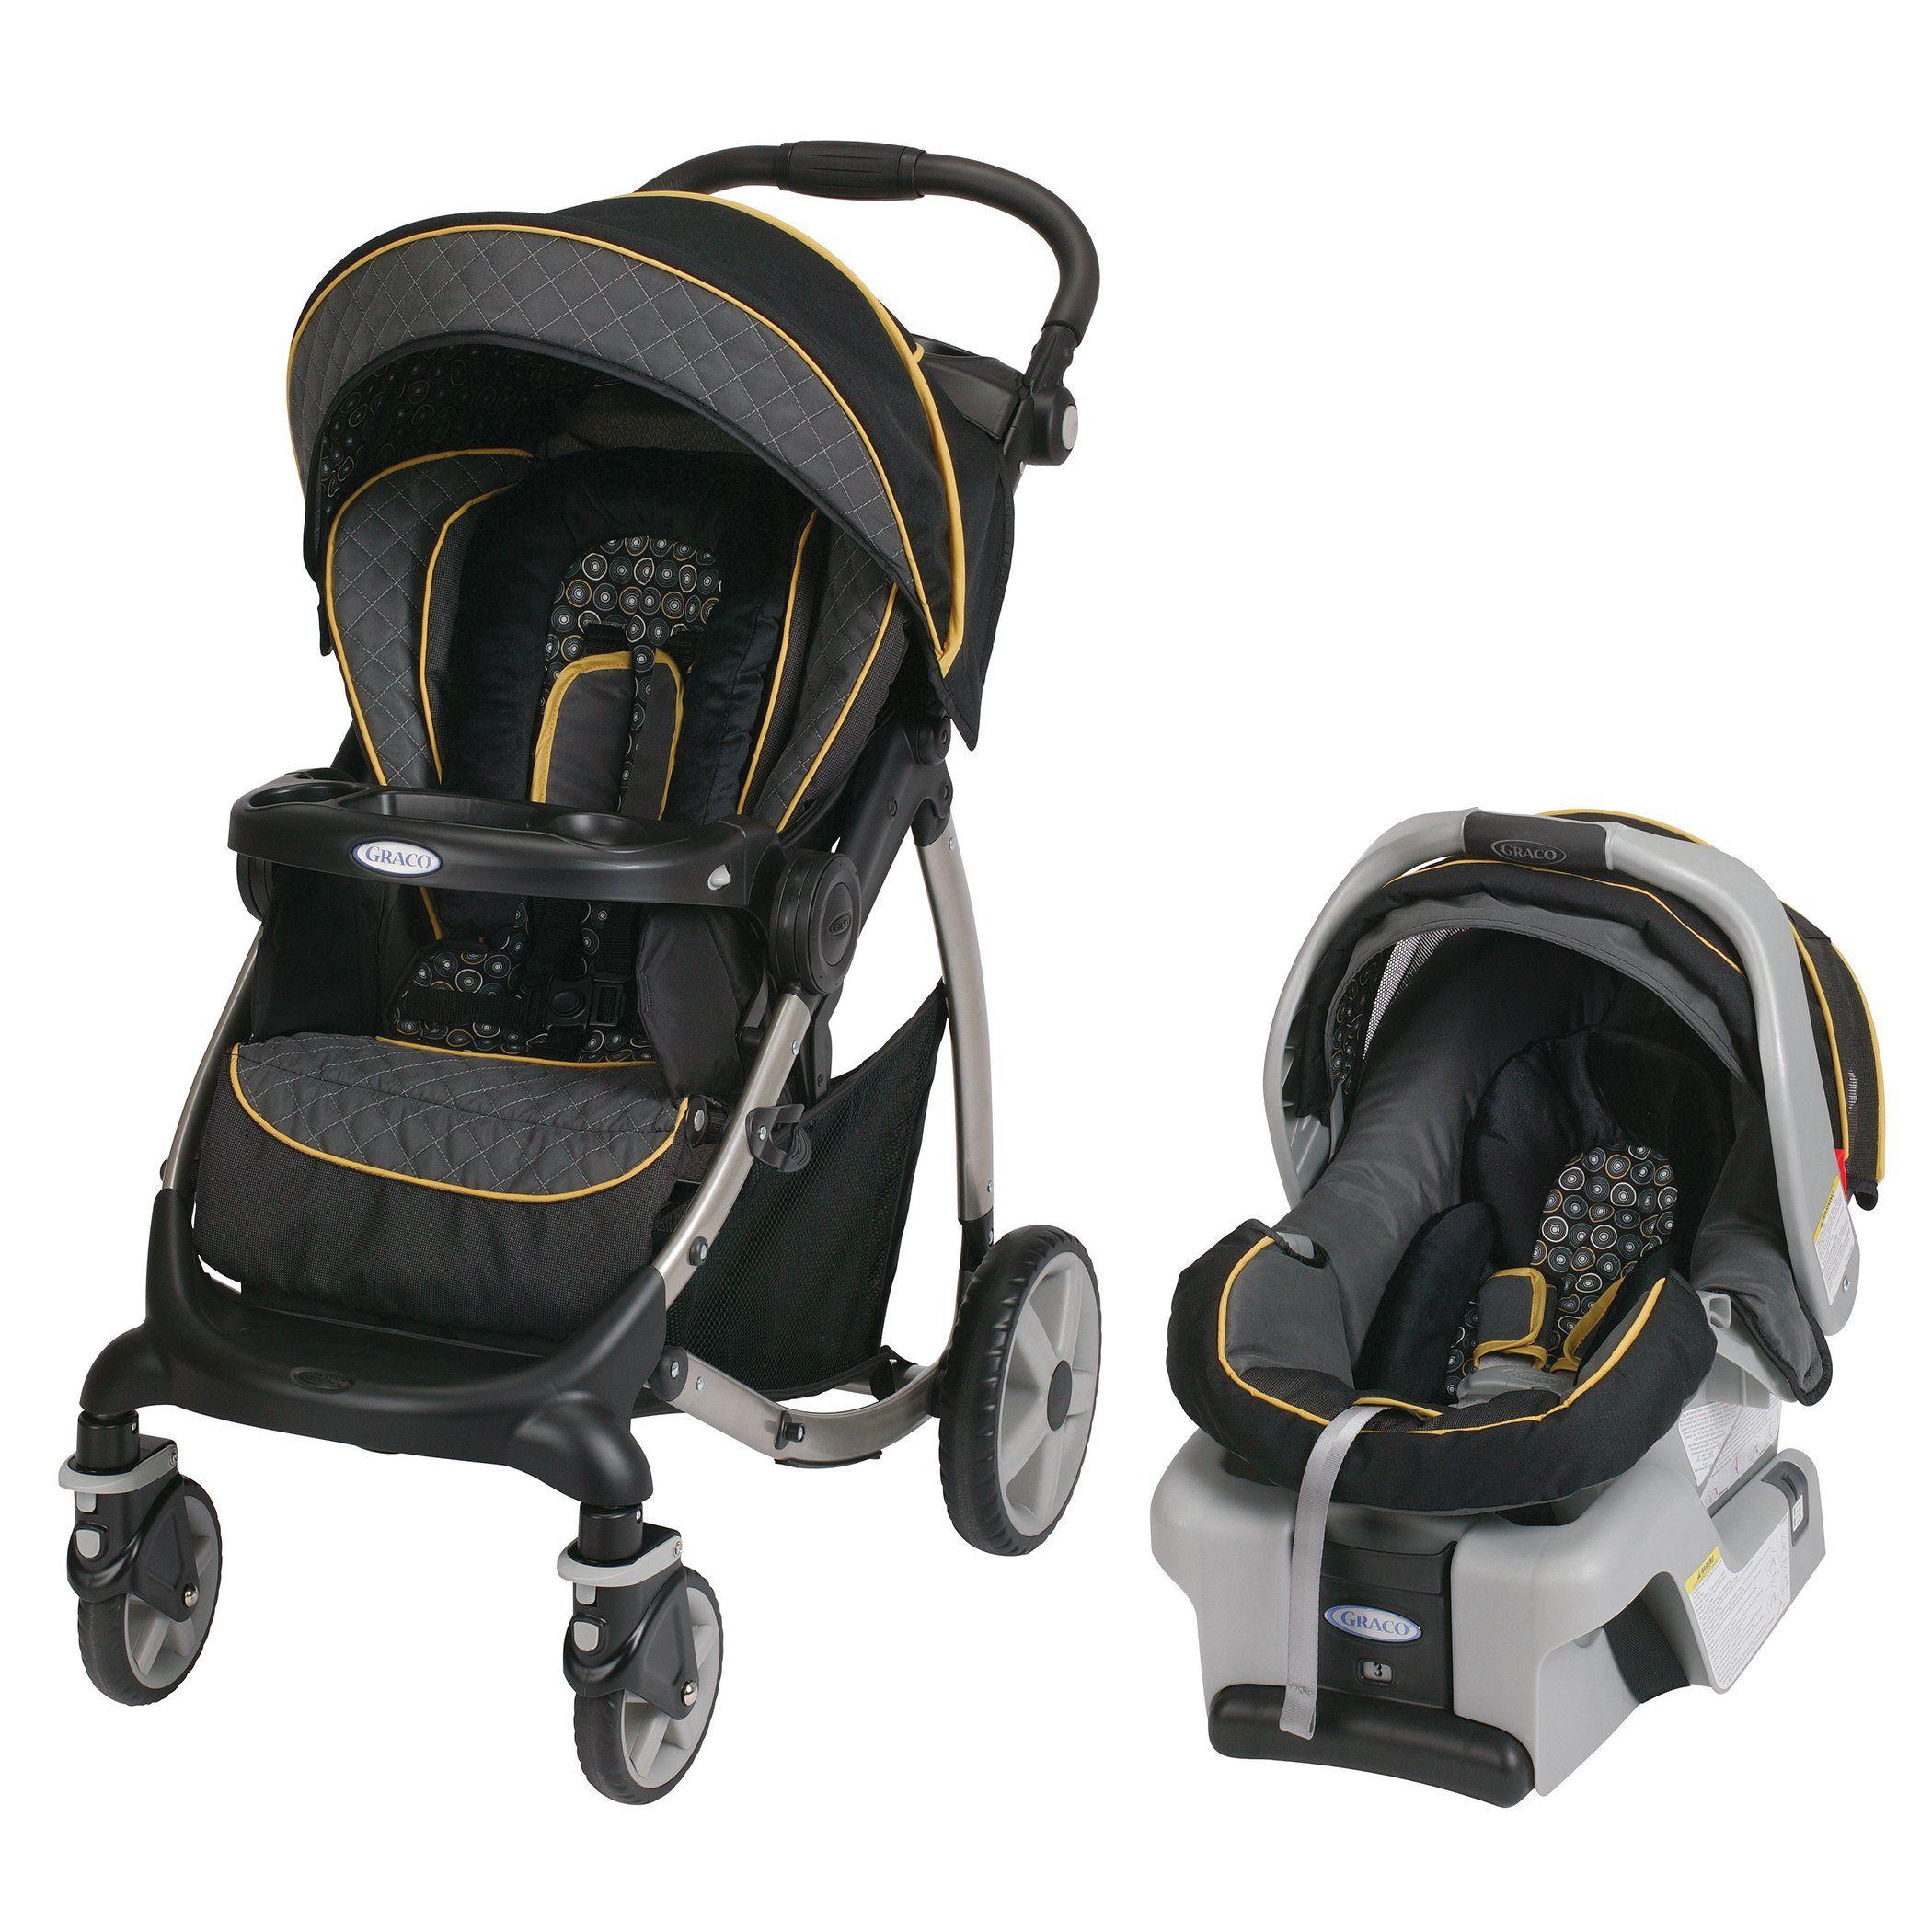 36++ Graco stroller accessories canada information